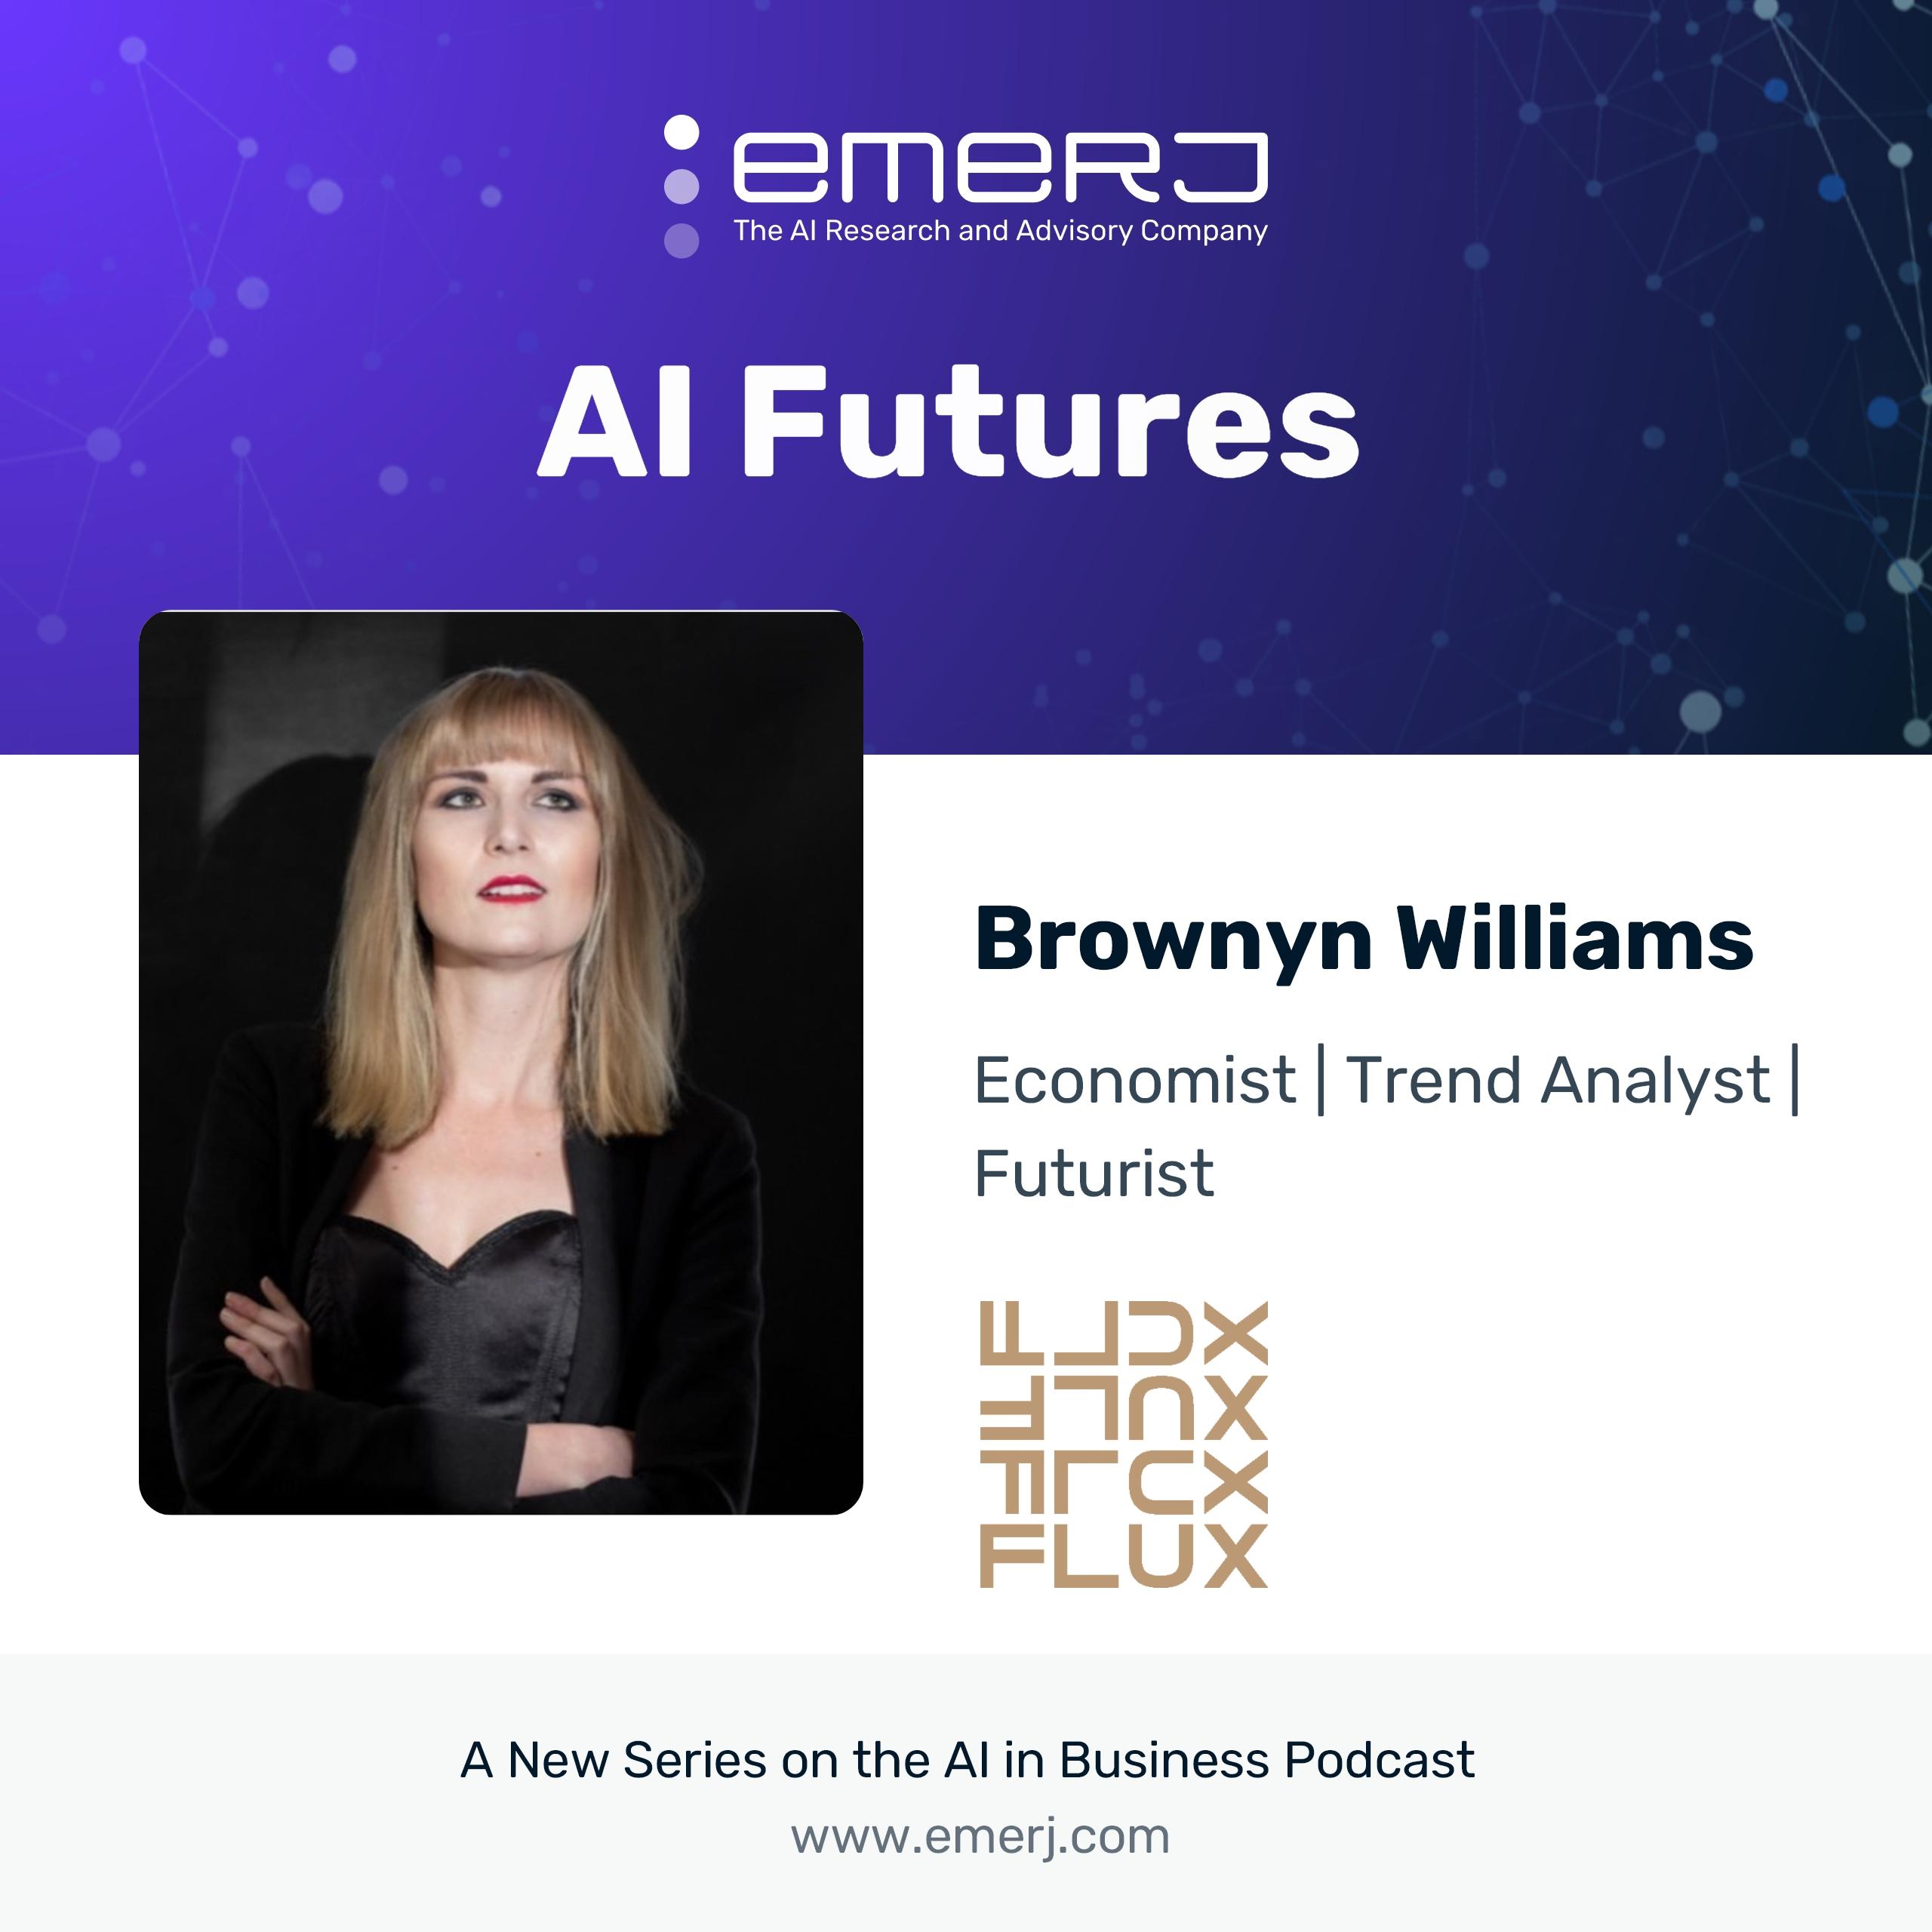 [AI Futures - S2E3] AI's Economic Impact in a Future of Digital/Virtual Immersion - with Bronwyn Williams